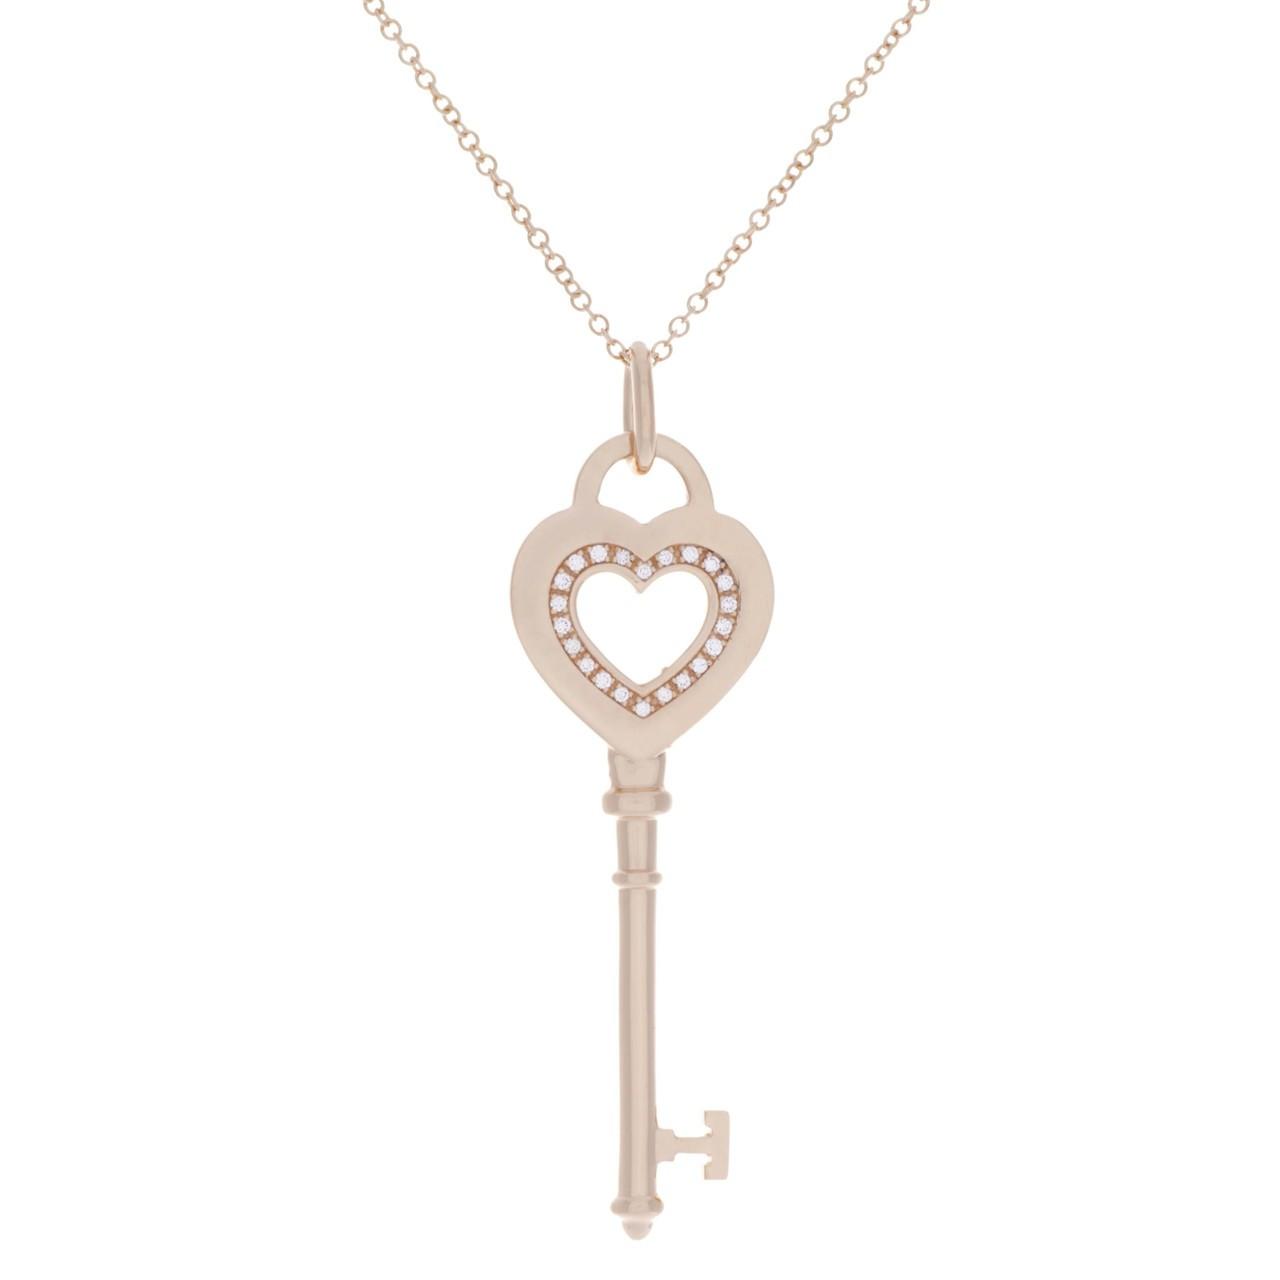 5500be08a Tiffany & Co 18K Rose Gold & Diamond Heart Key Pendant - modaselle